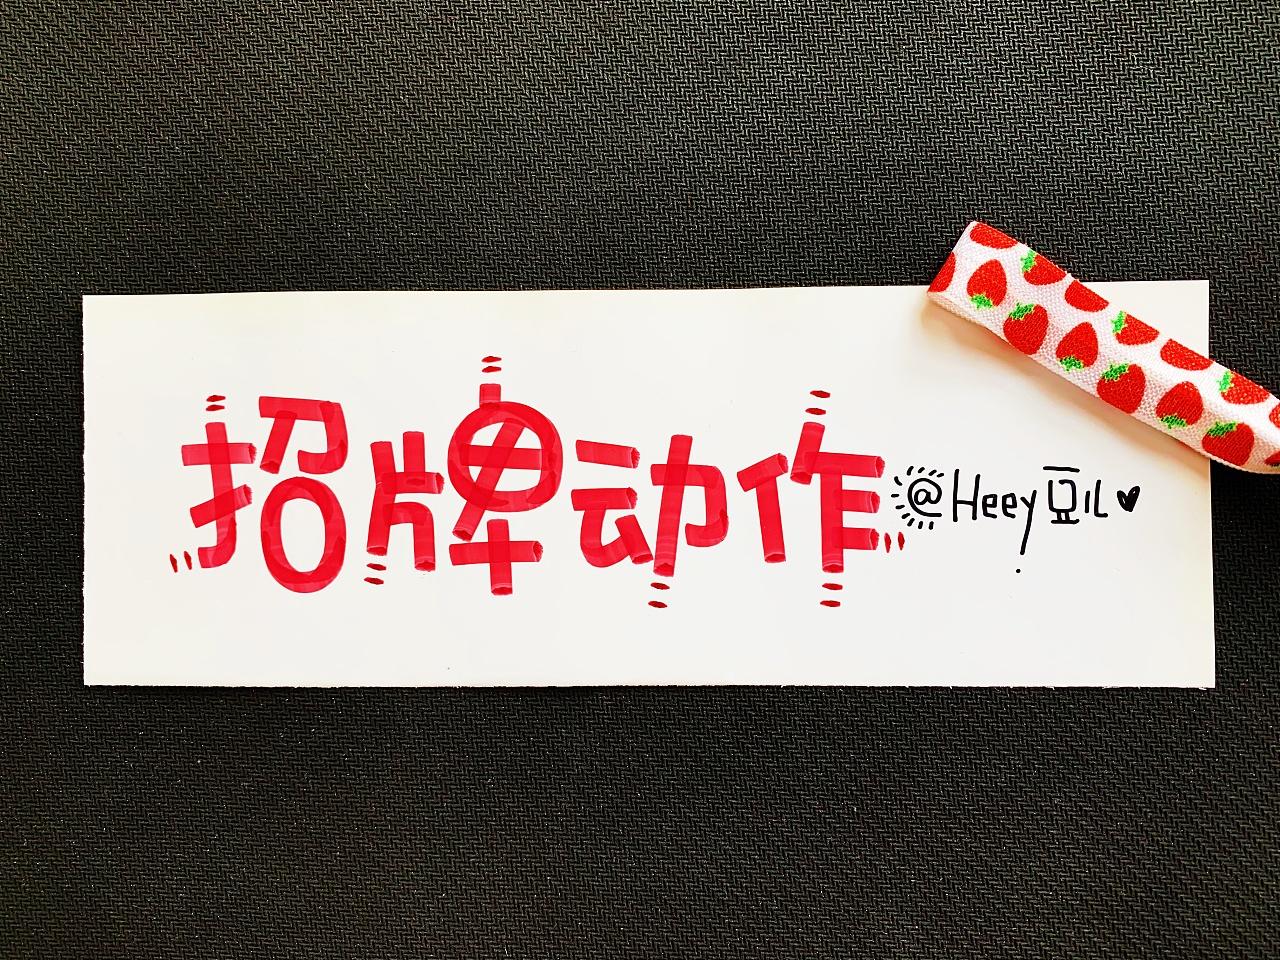 Chinese Creative Font Design-Heey Doo | Mark Pen (Jolin Tsai)